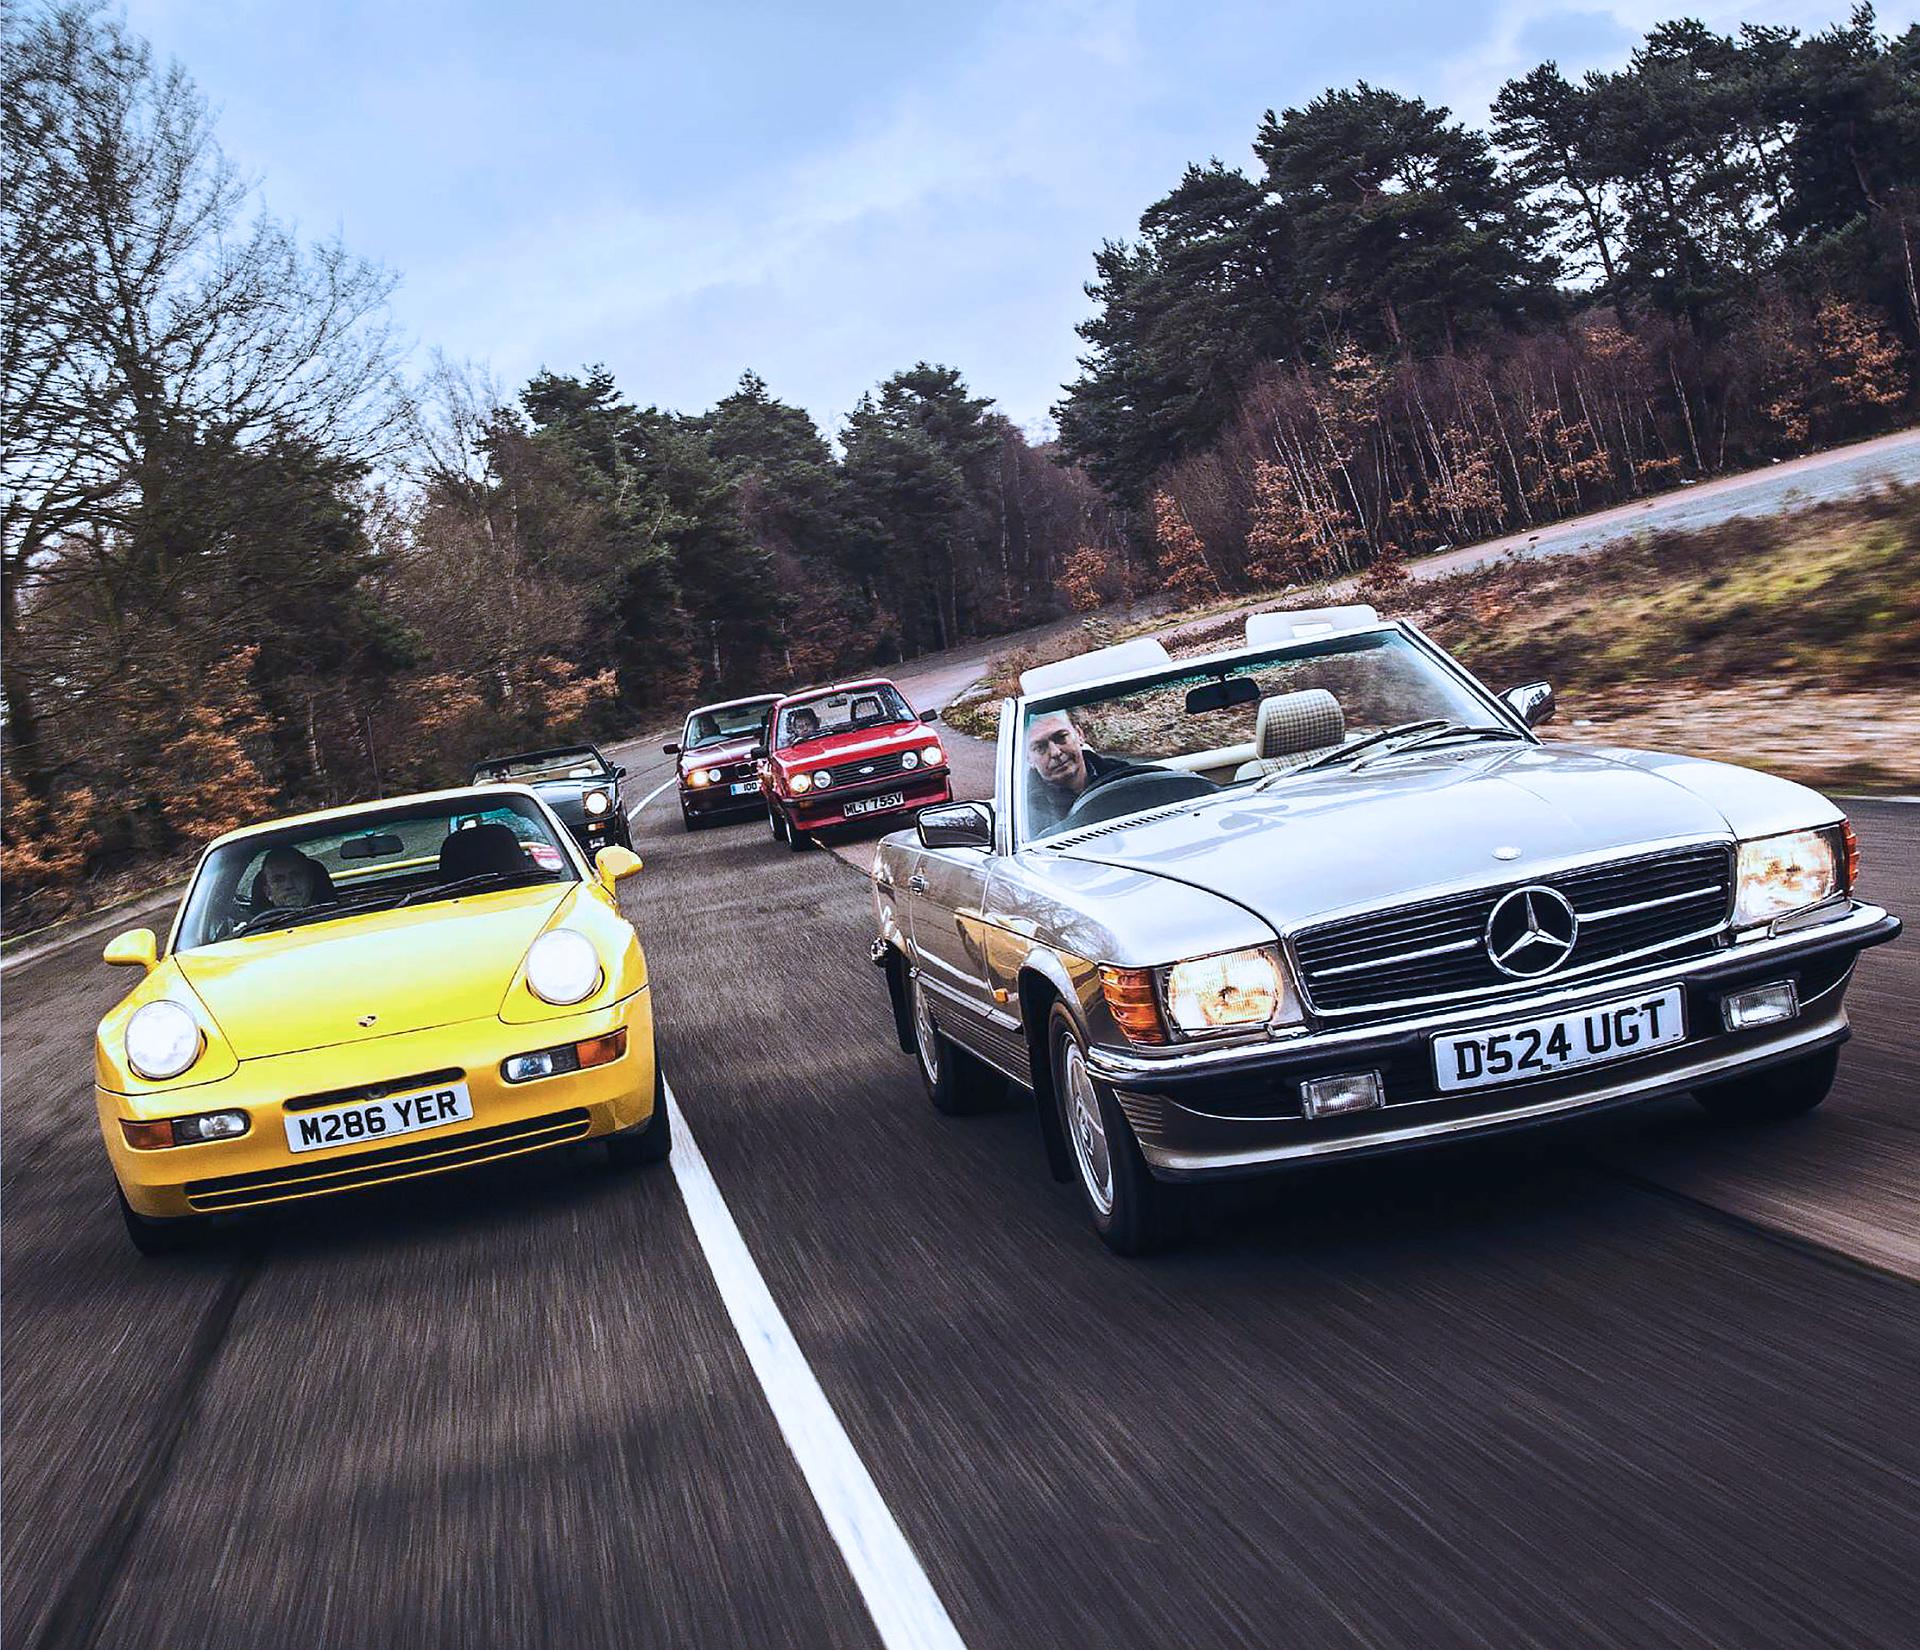 Giant-test Porsche 968 Club Sport vs TVR 350i, BMW E34 M5, Ford Escort RS 2000 and Mercedes-Benz 500 SL R107